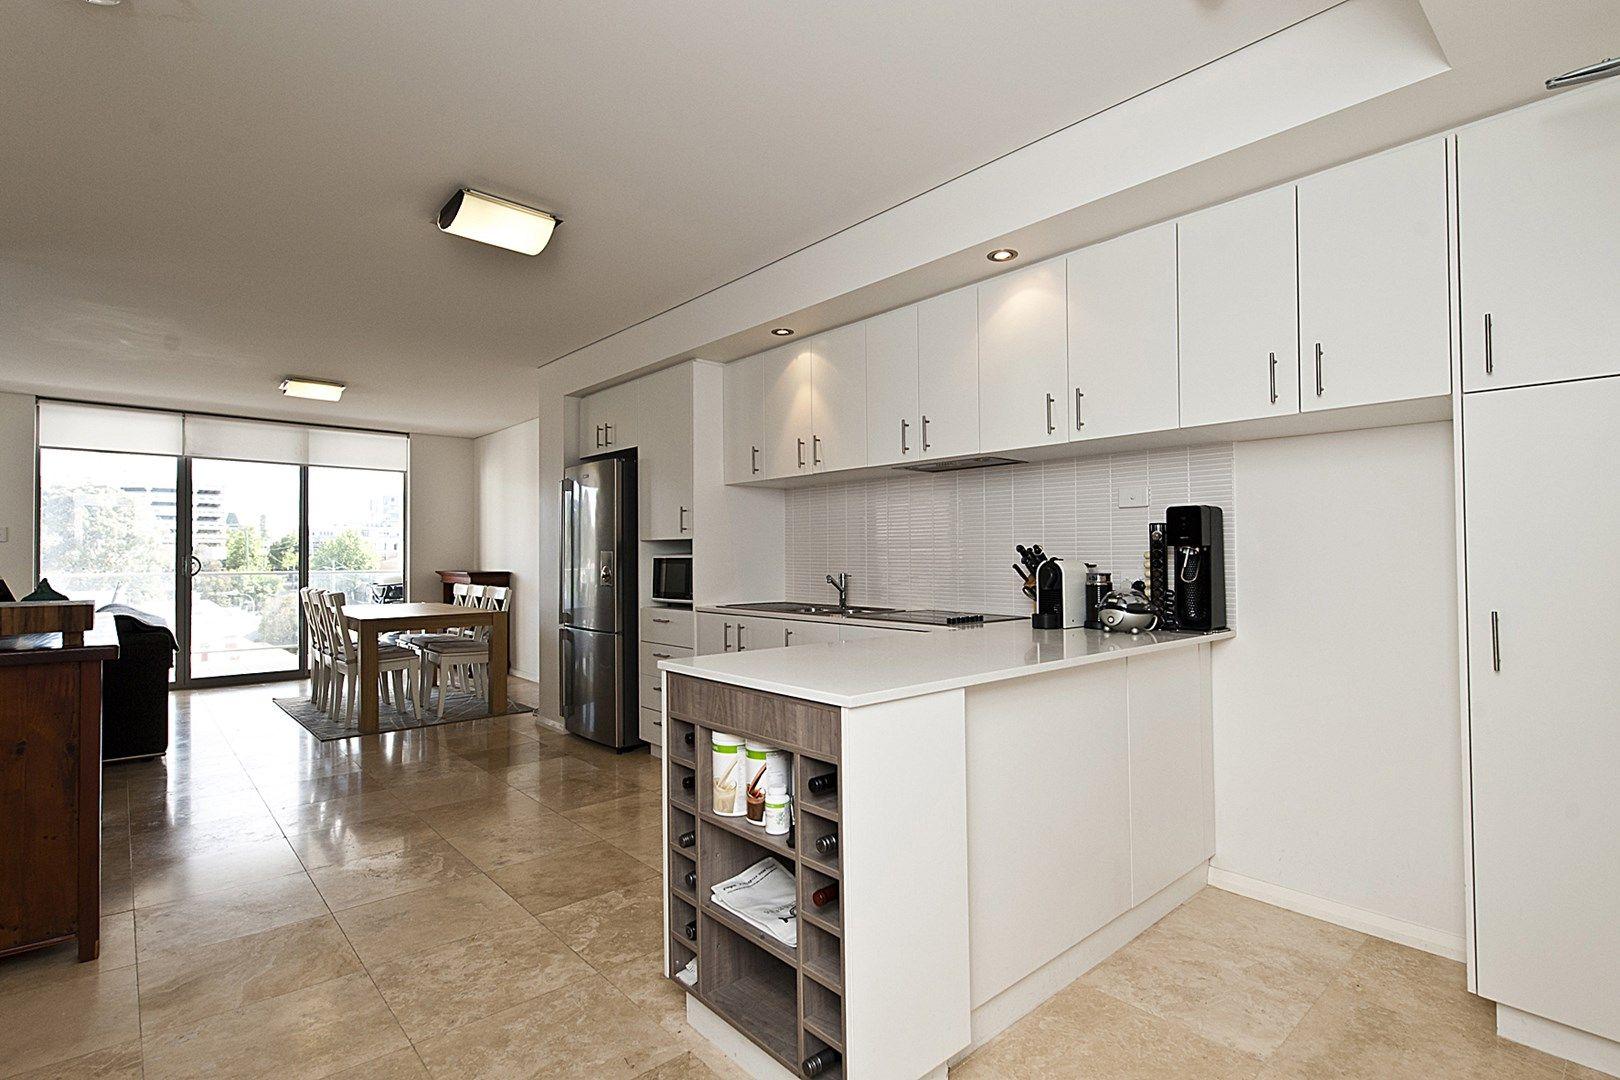 27/1 Douro Place, West Perth WA 6005, Image 0